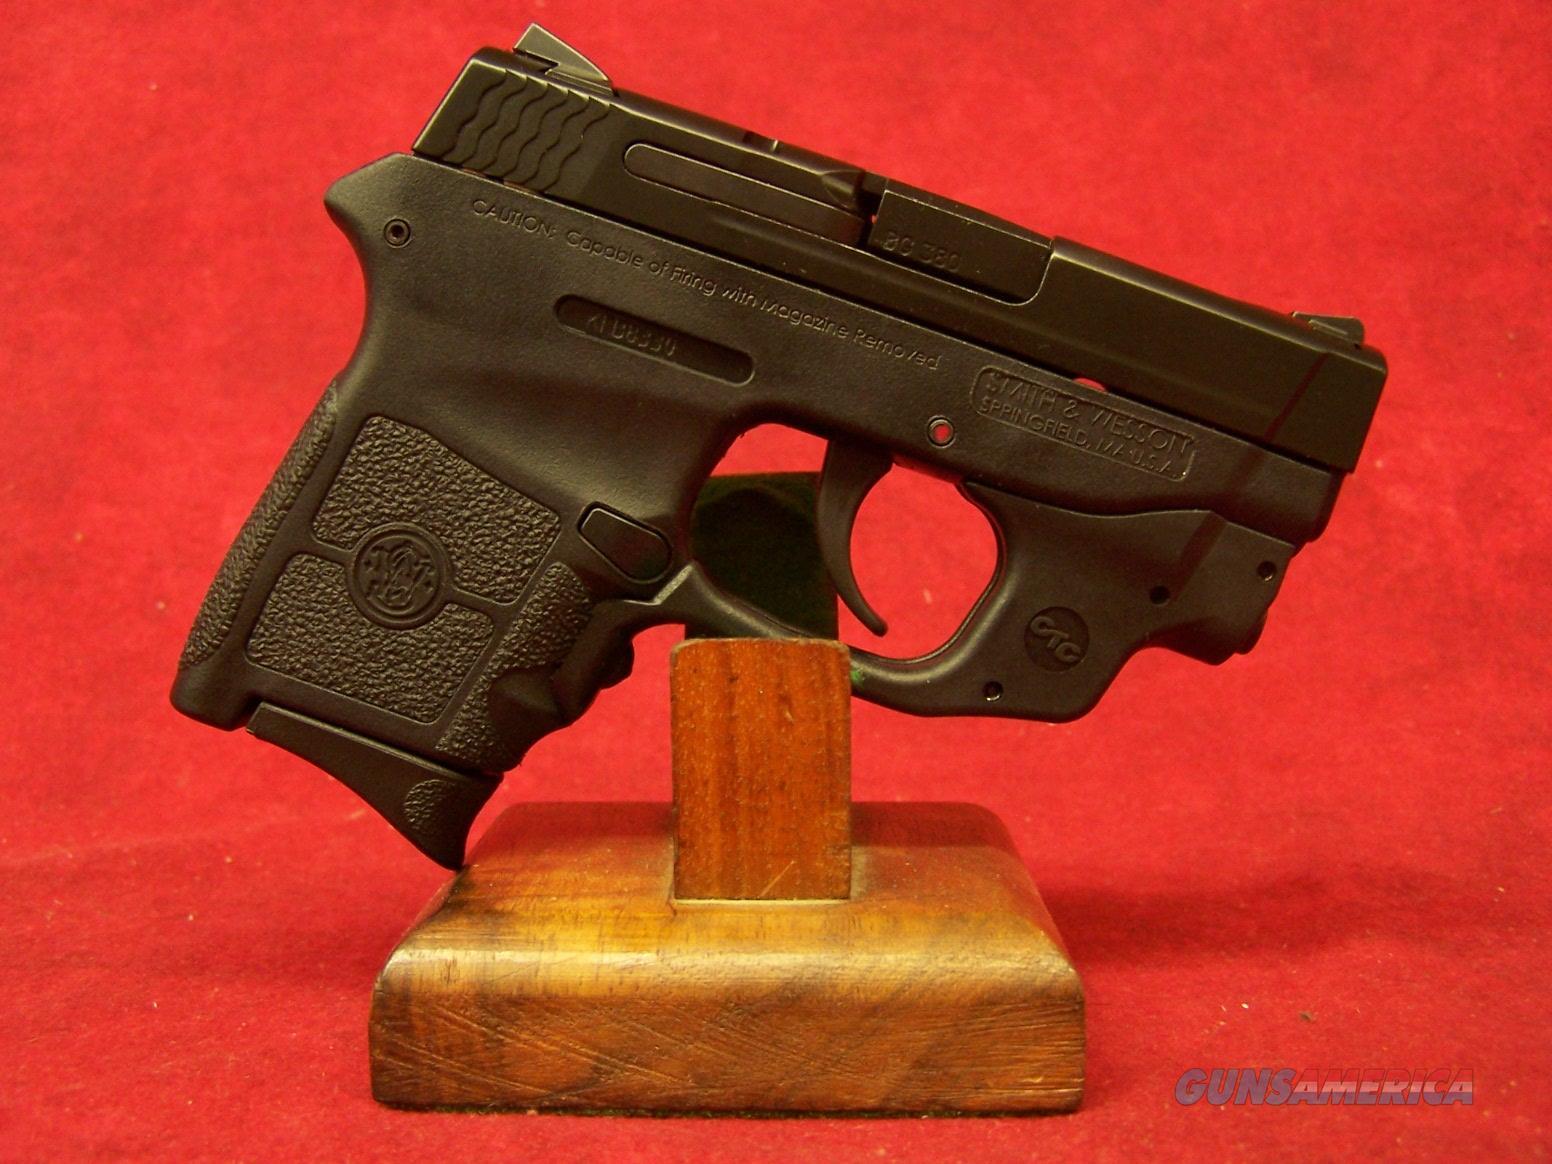 "Smith & Wesson M&P Bodyguard Green Crimson Trace .380 Auto 2.75"" Barrel (10178)  Guns > Pistols > Smith & Wesson Pistols - Autos > Polymer Frame"